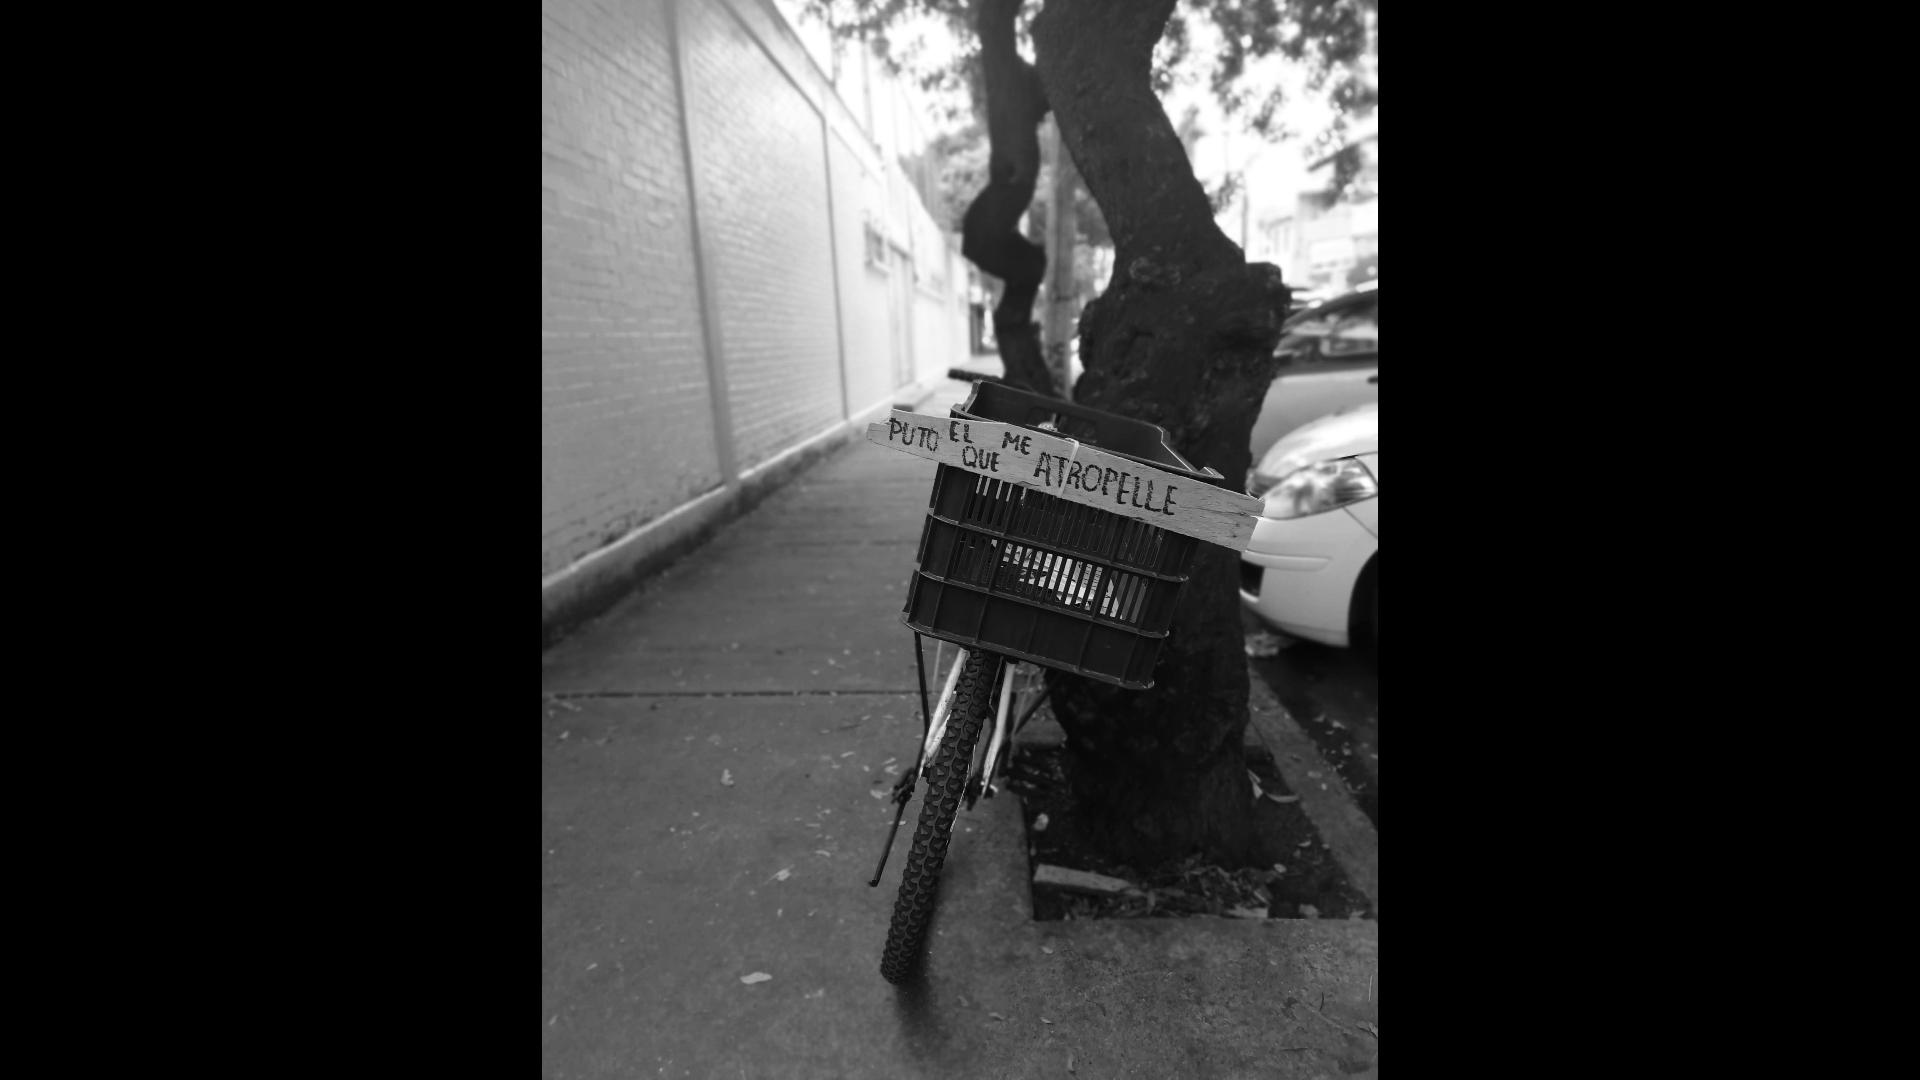 Bicicleta recargad en un árbol